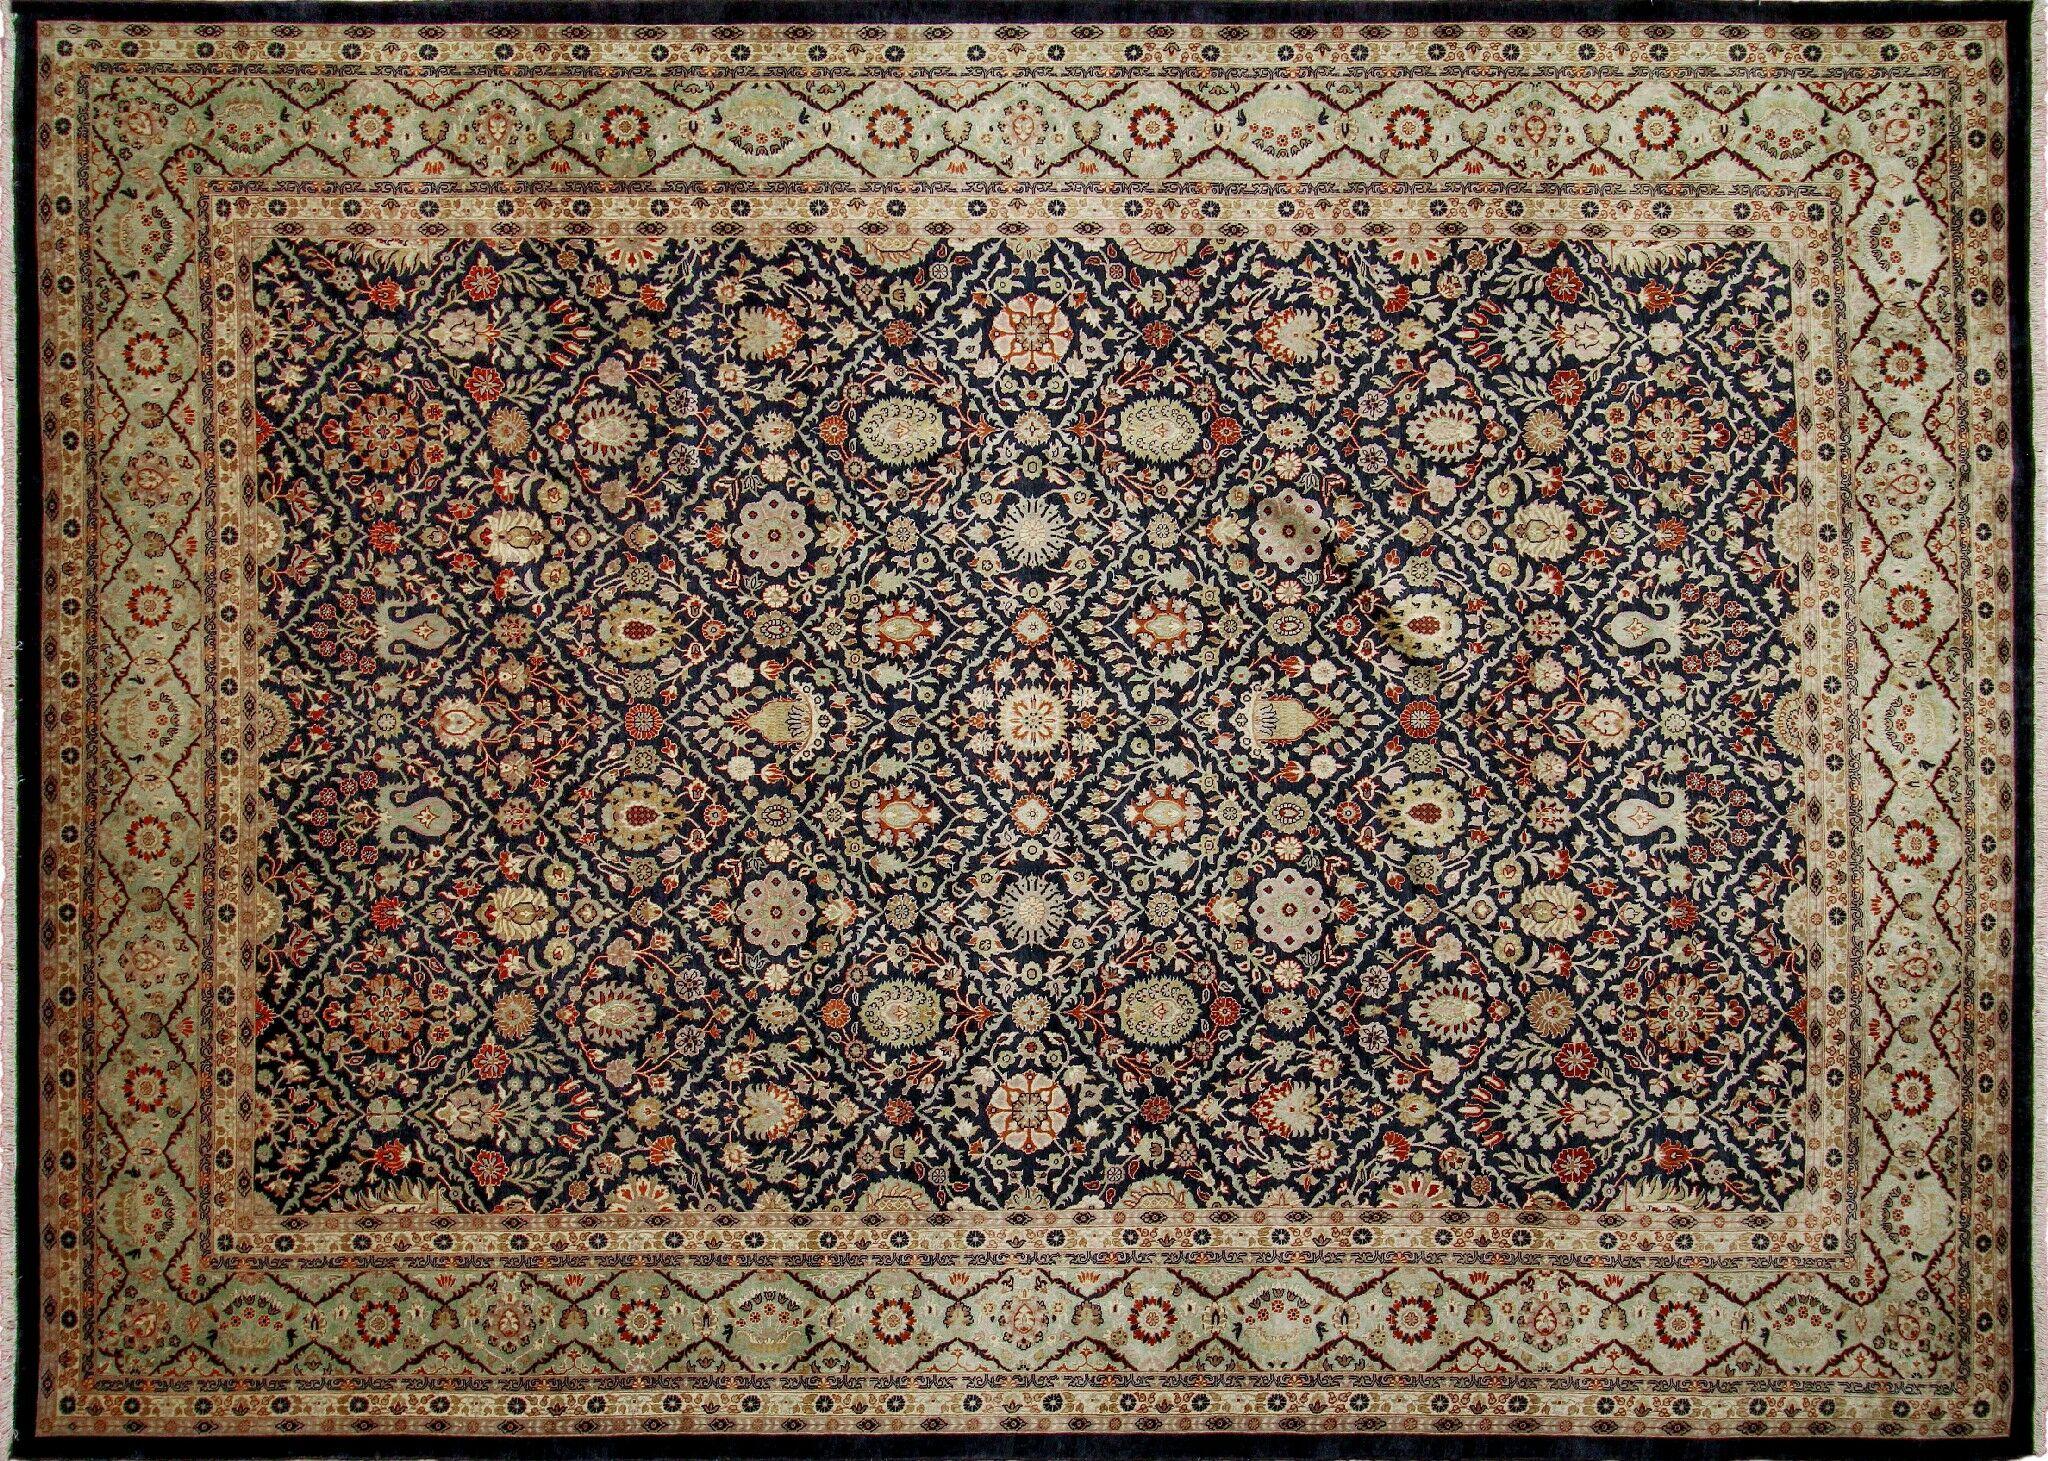 Ankara Juldyz Hand Knotted Wool Black Area Rug Rug Size: Rectangle 10'3